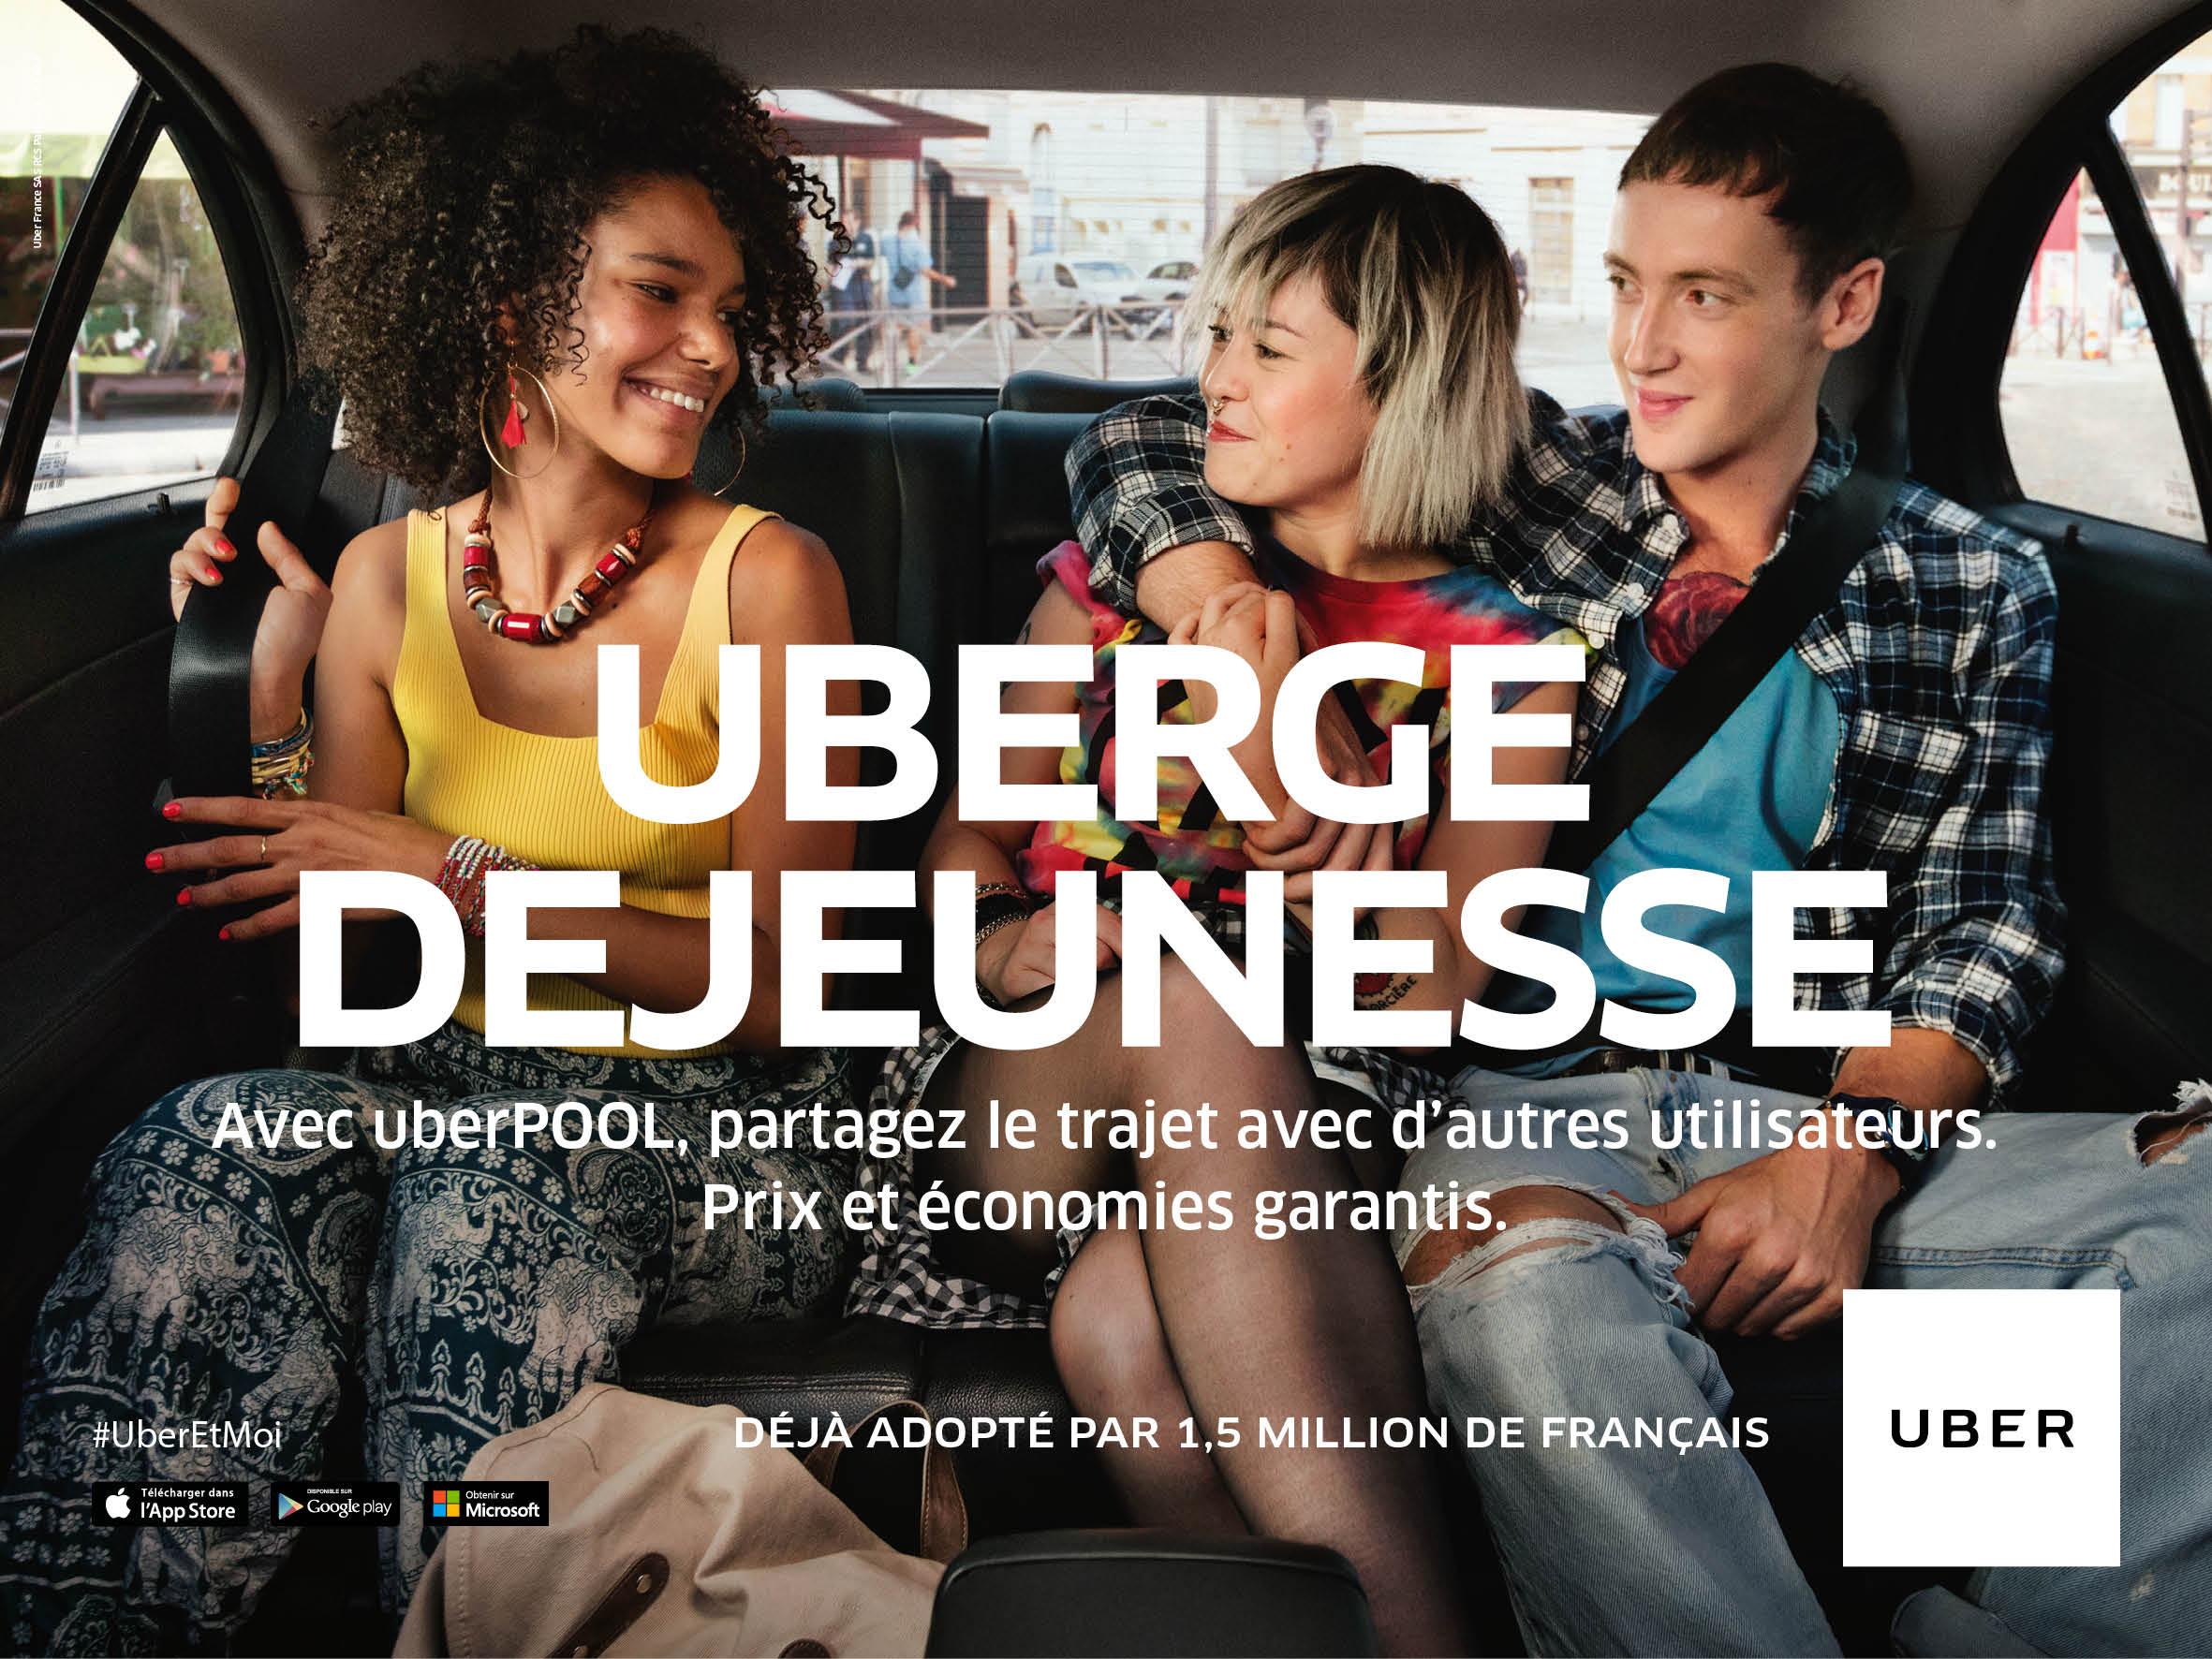 uber-france-publicite-marketing-application-utilisateurs-passagers-mars-2016-agence-marcel-publicis-4